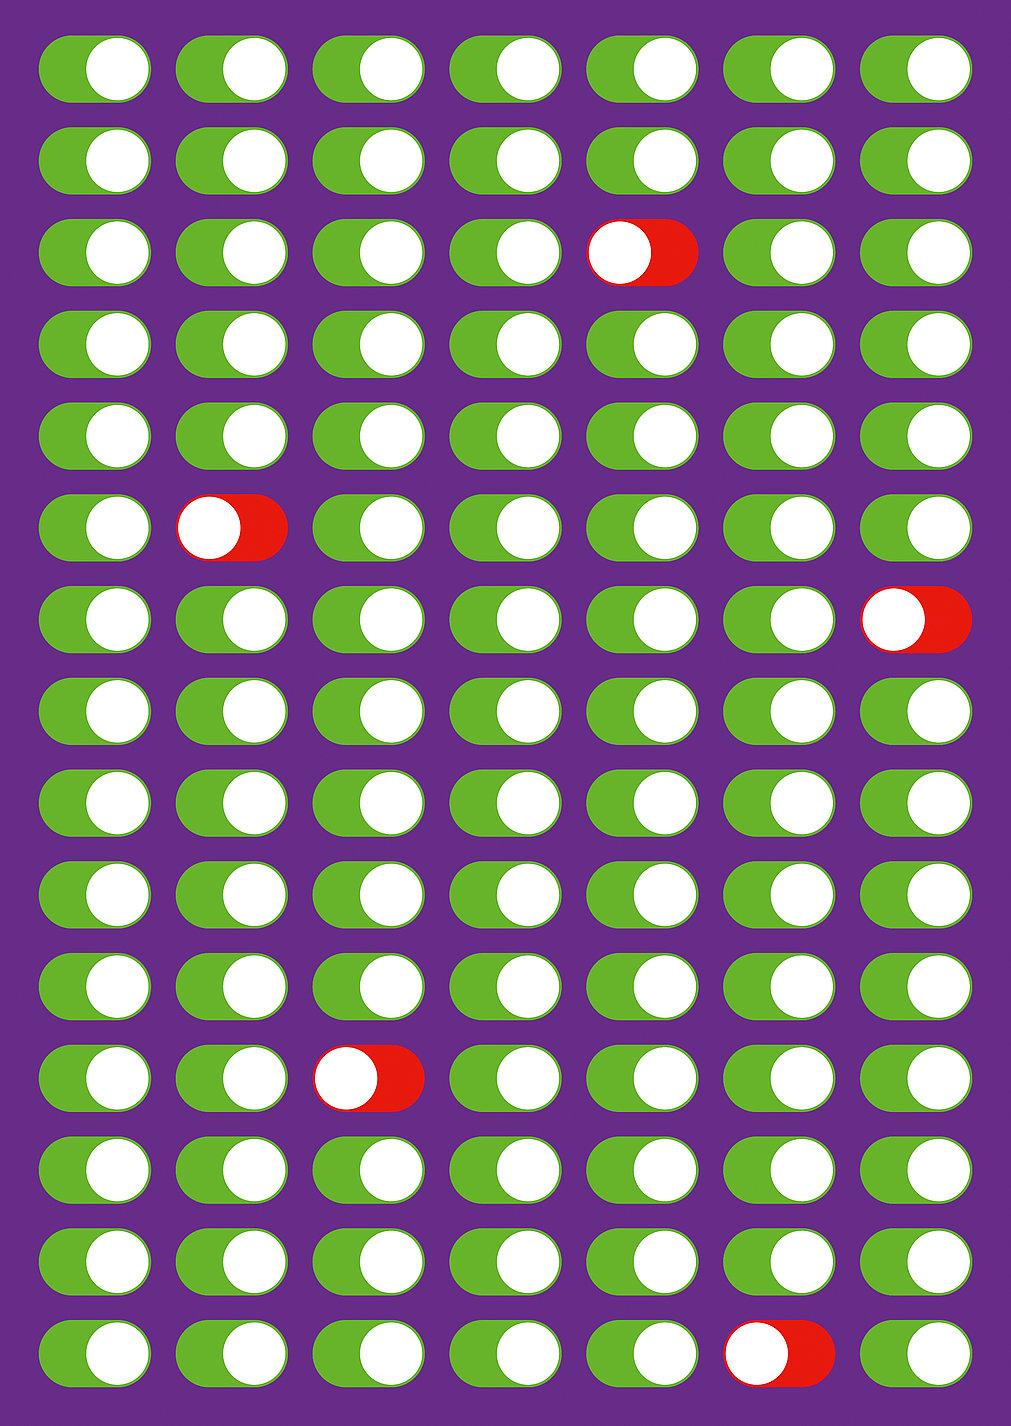 FI-Connect | Red Dot Design Award